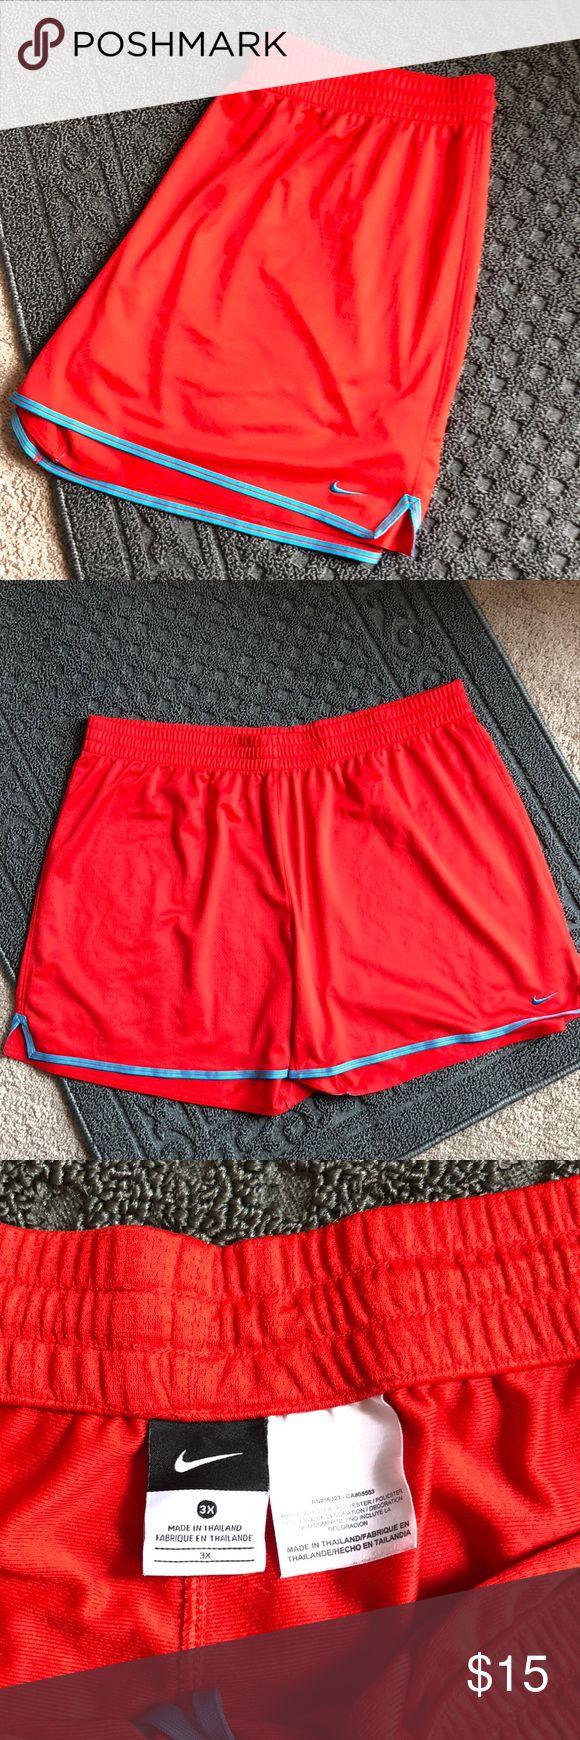 Herren Nike Shorts Orange / Blau Nike Short. Blaues Logo unten links. Blau …   – My Posh Picks